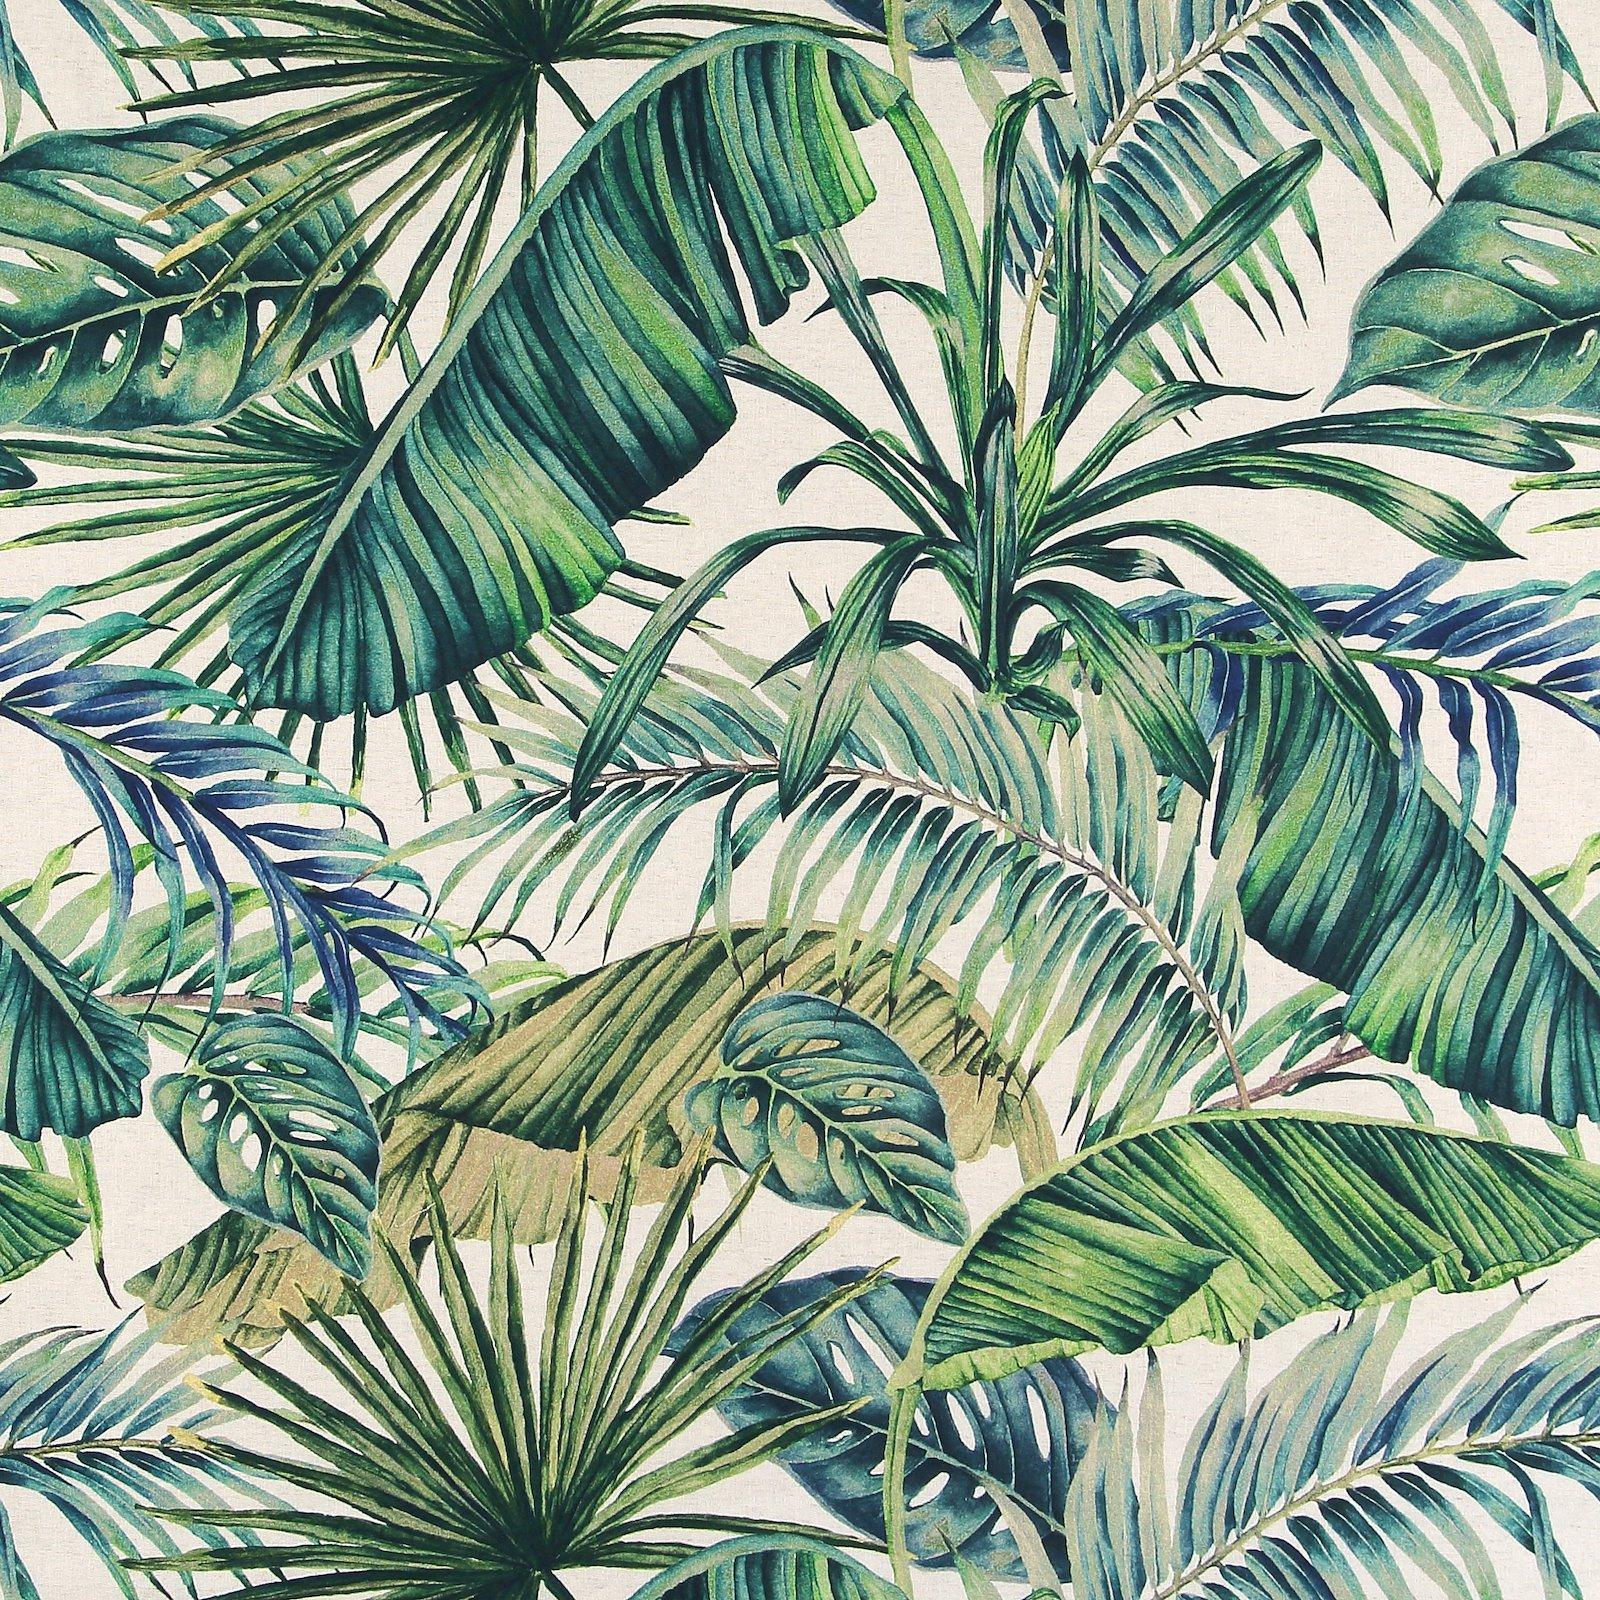 Woven cotton/linen natural w. leaves 780588_pack_lp